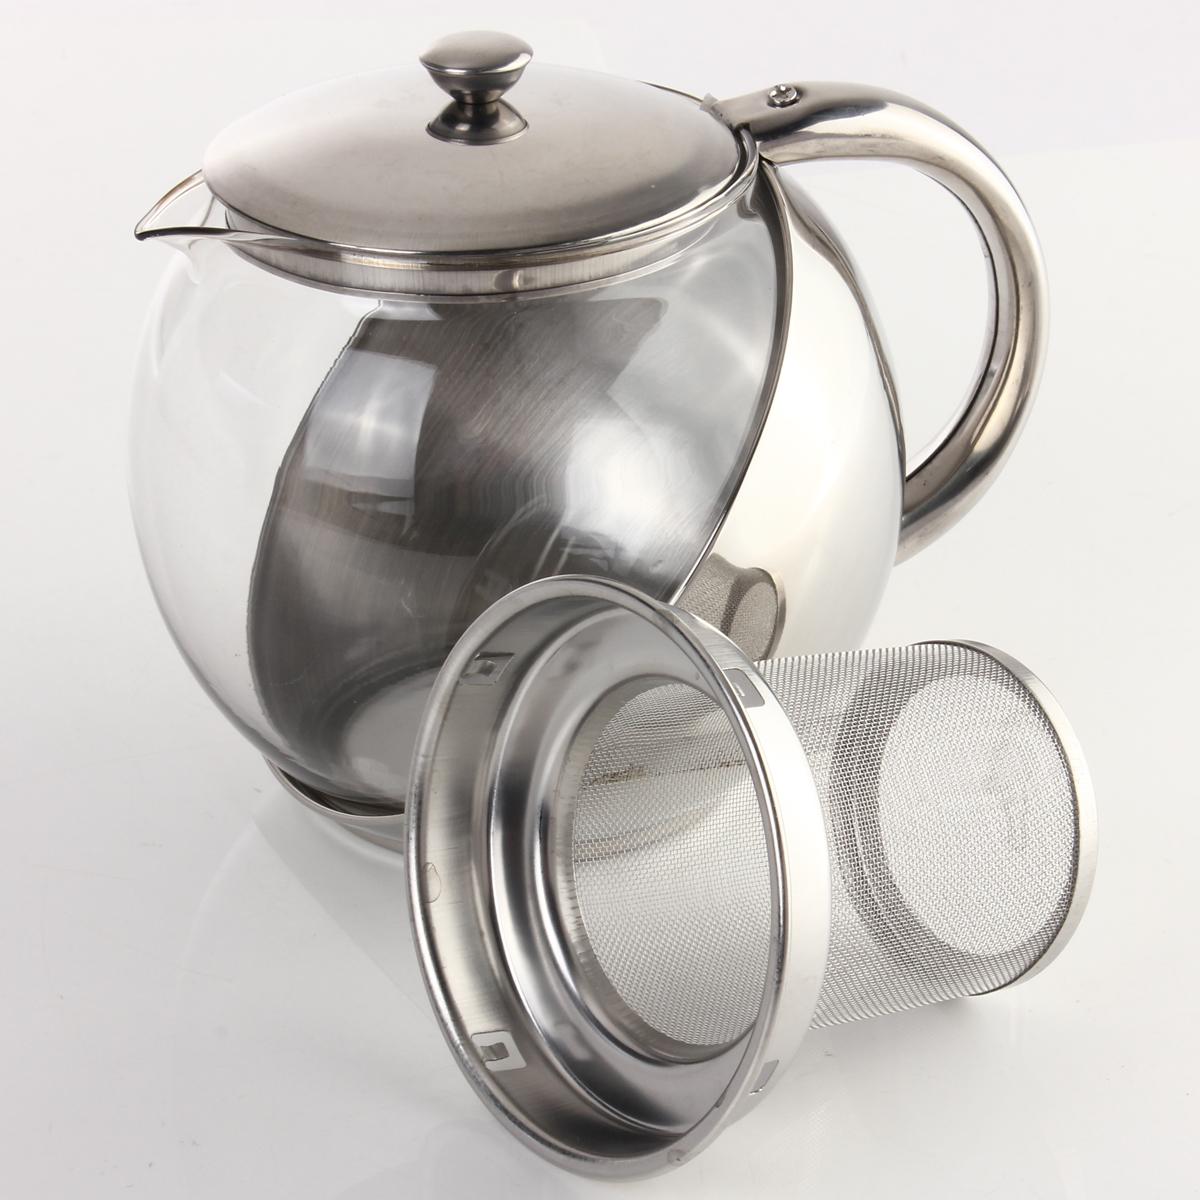 moderne verre th i re pot acier inoxydable avec filtre passoire 500 750 900 ml. Black Bedroom Furniture Sets. Home Design Ideas